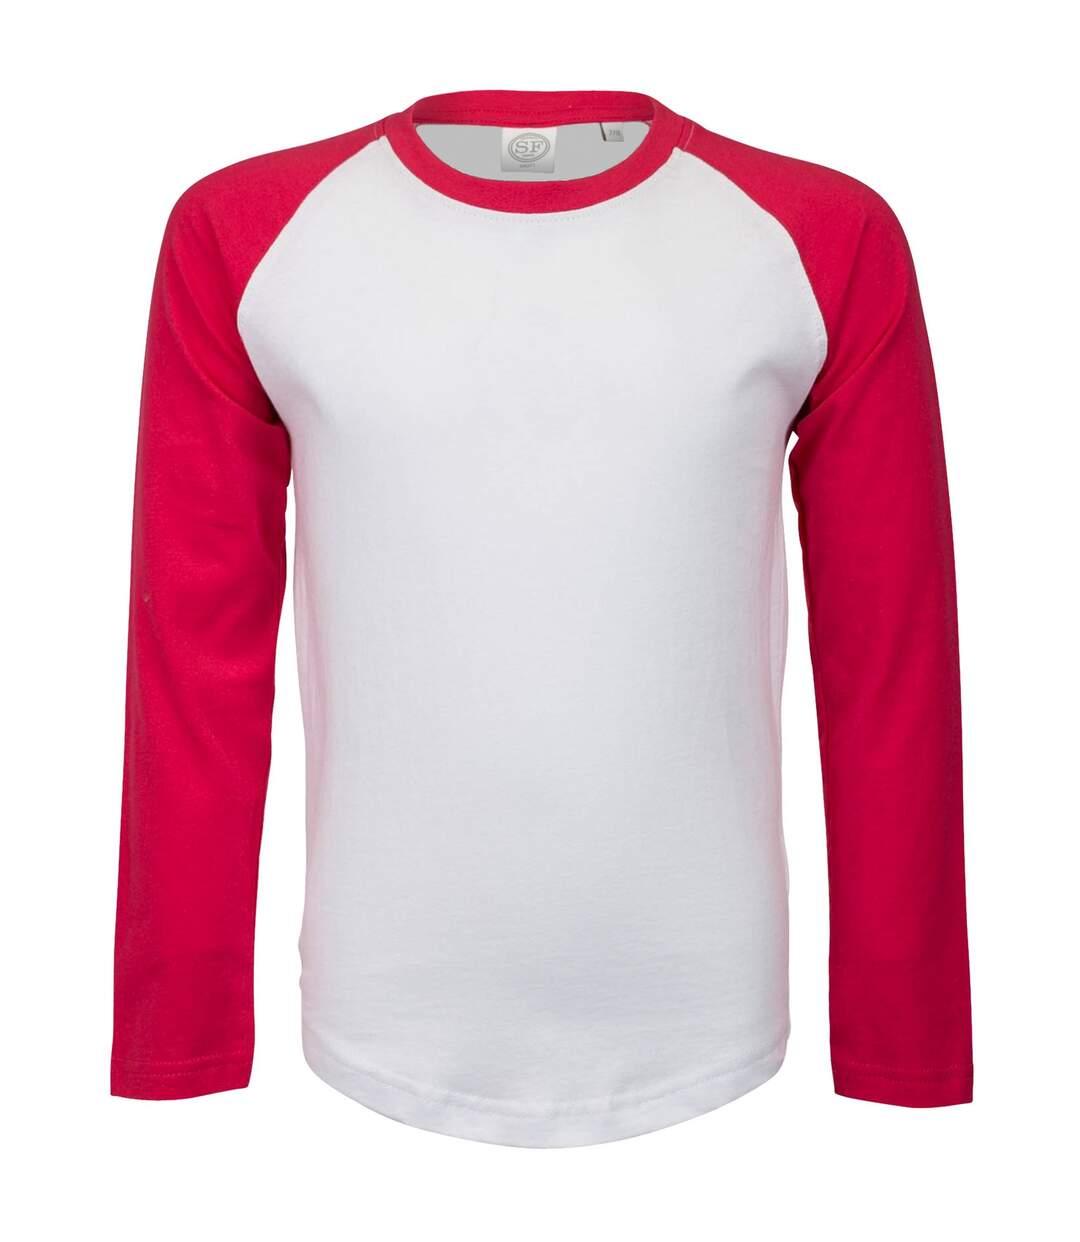 Skinni Fit - T-Shirt À Manches Longues - Femme (Blanc/Rose) - UTRW4731